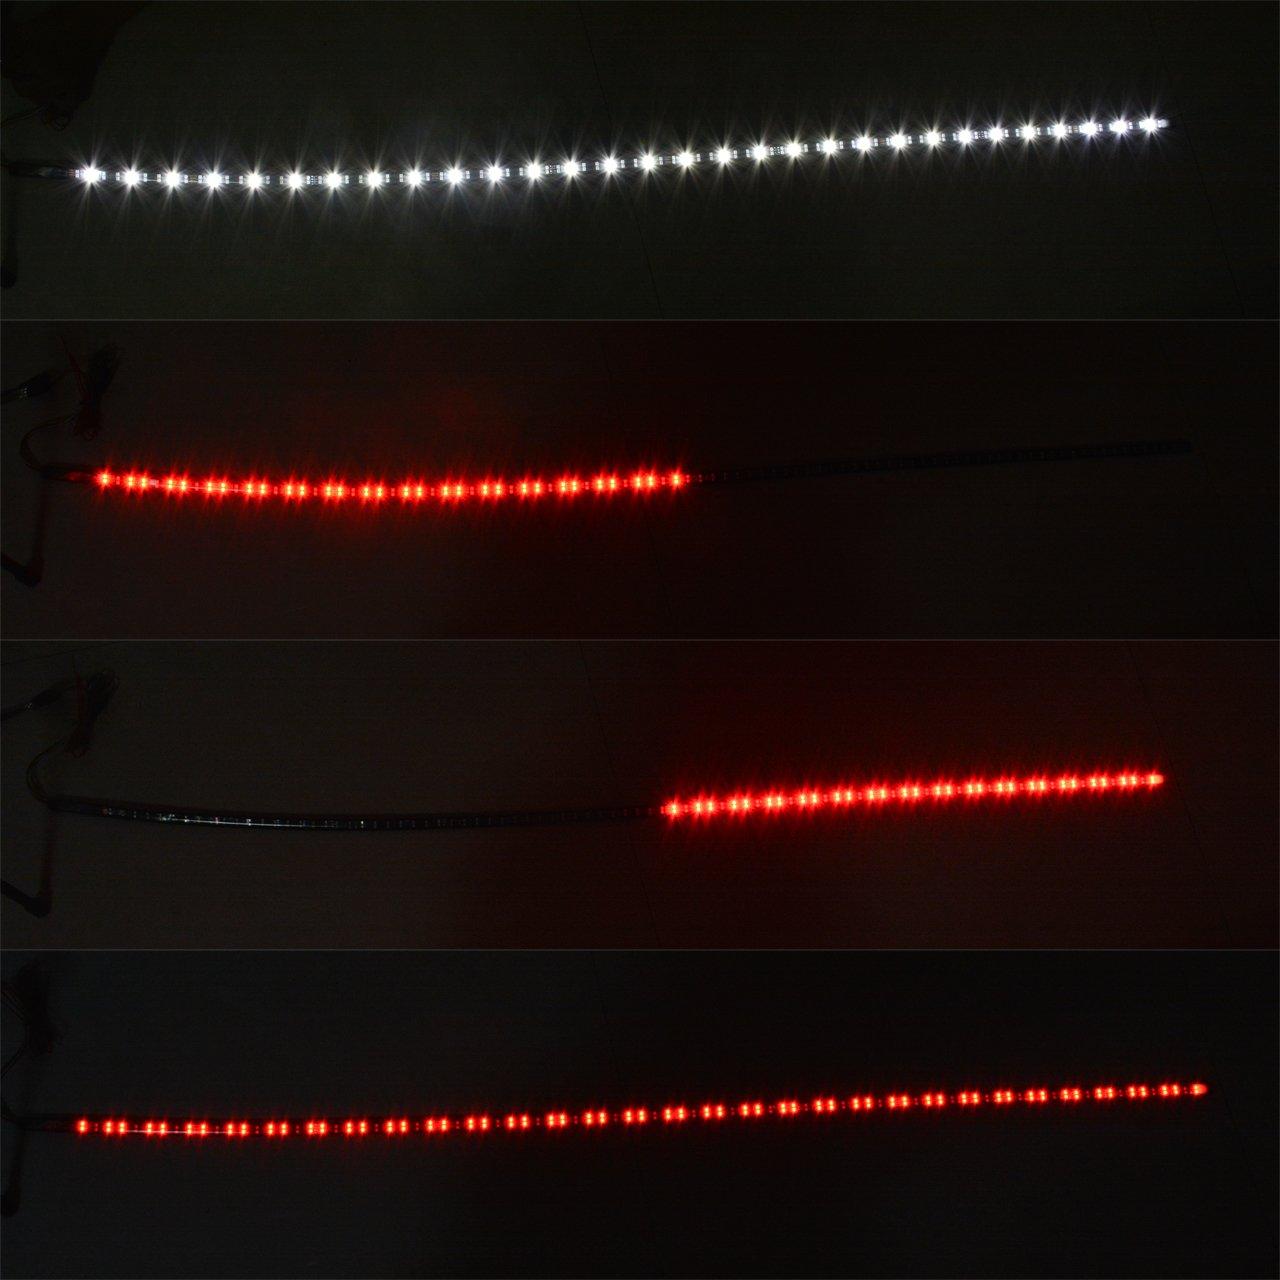 katur 119,4 cm LED Heckklappe Light Bar Rot/Weiß wetterfest starr ...